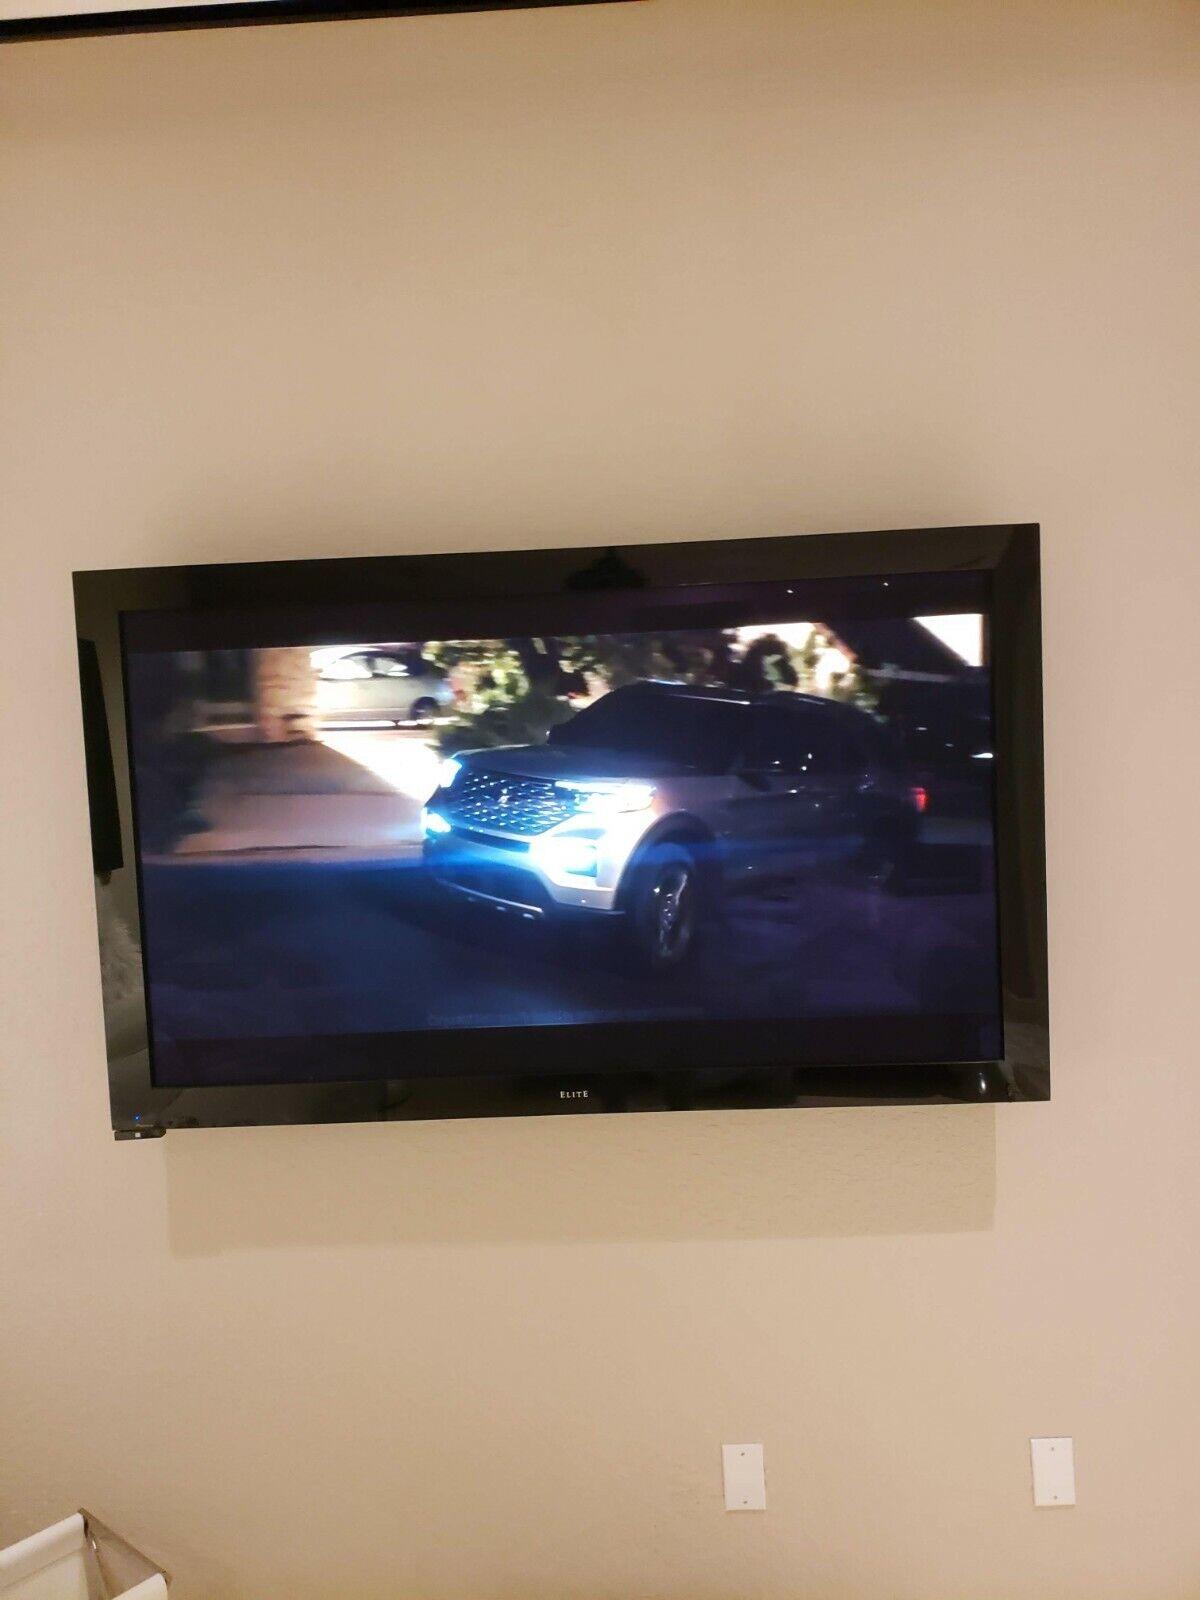 Elite HD Plasma Television Great Quality